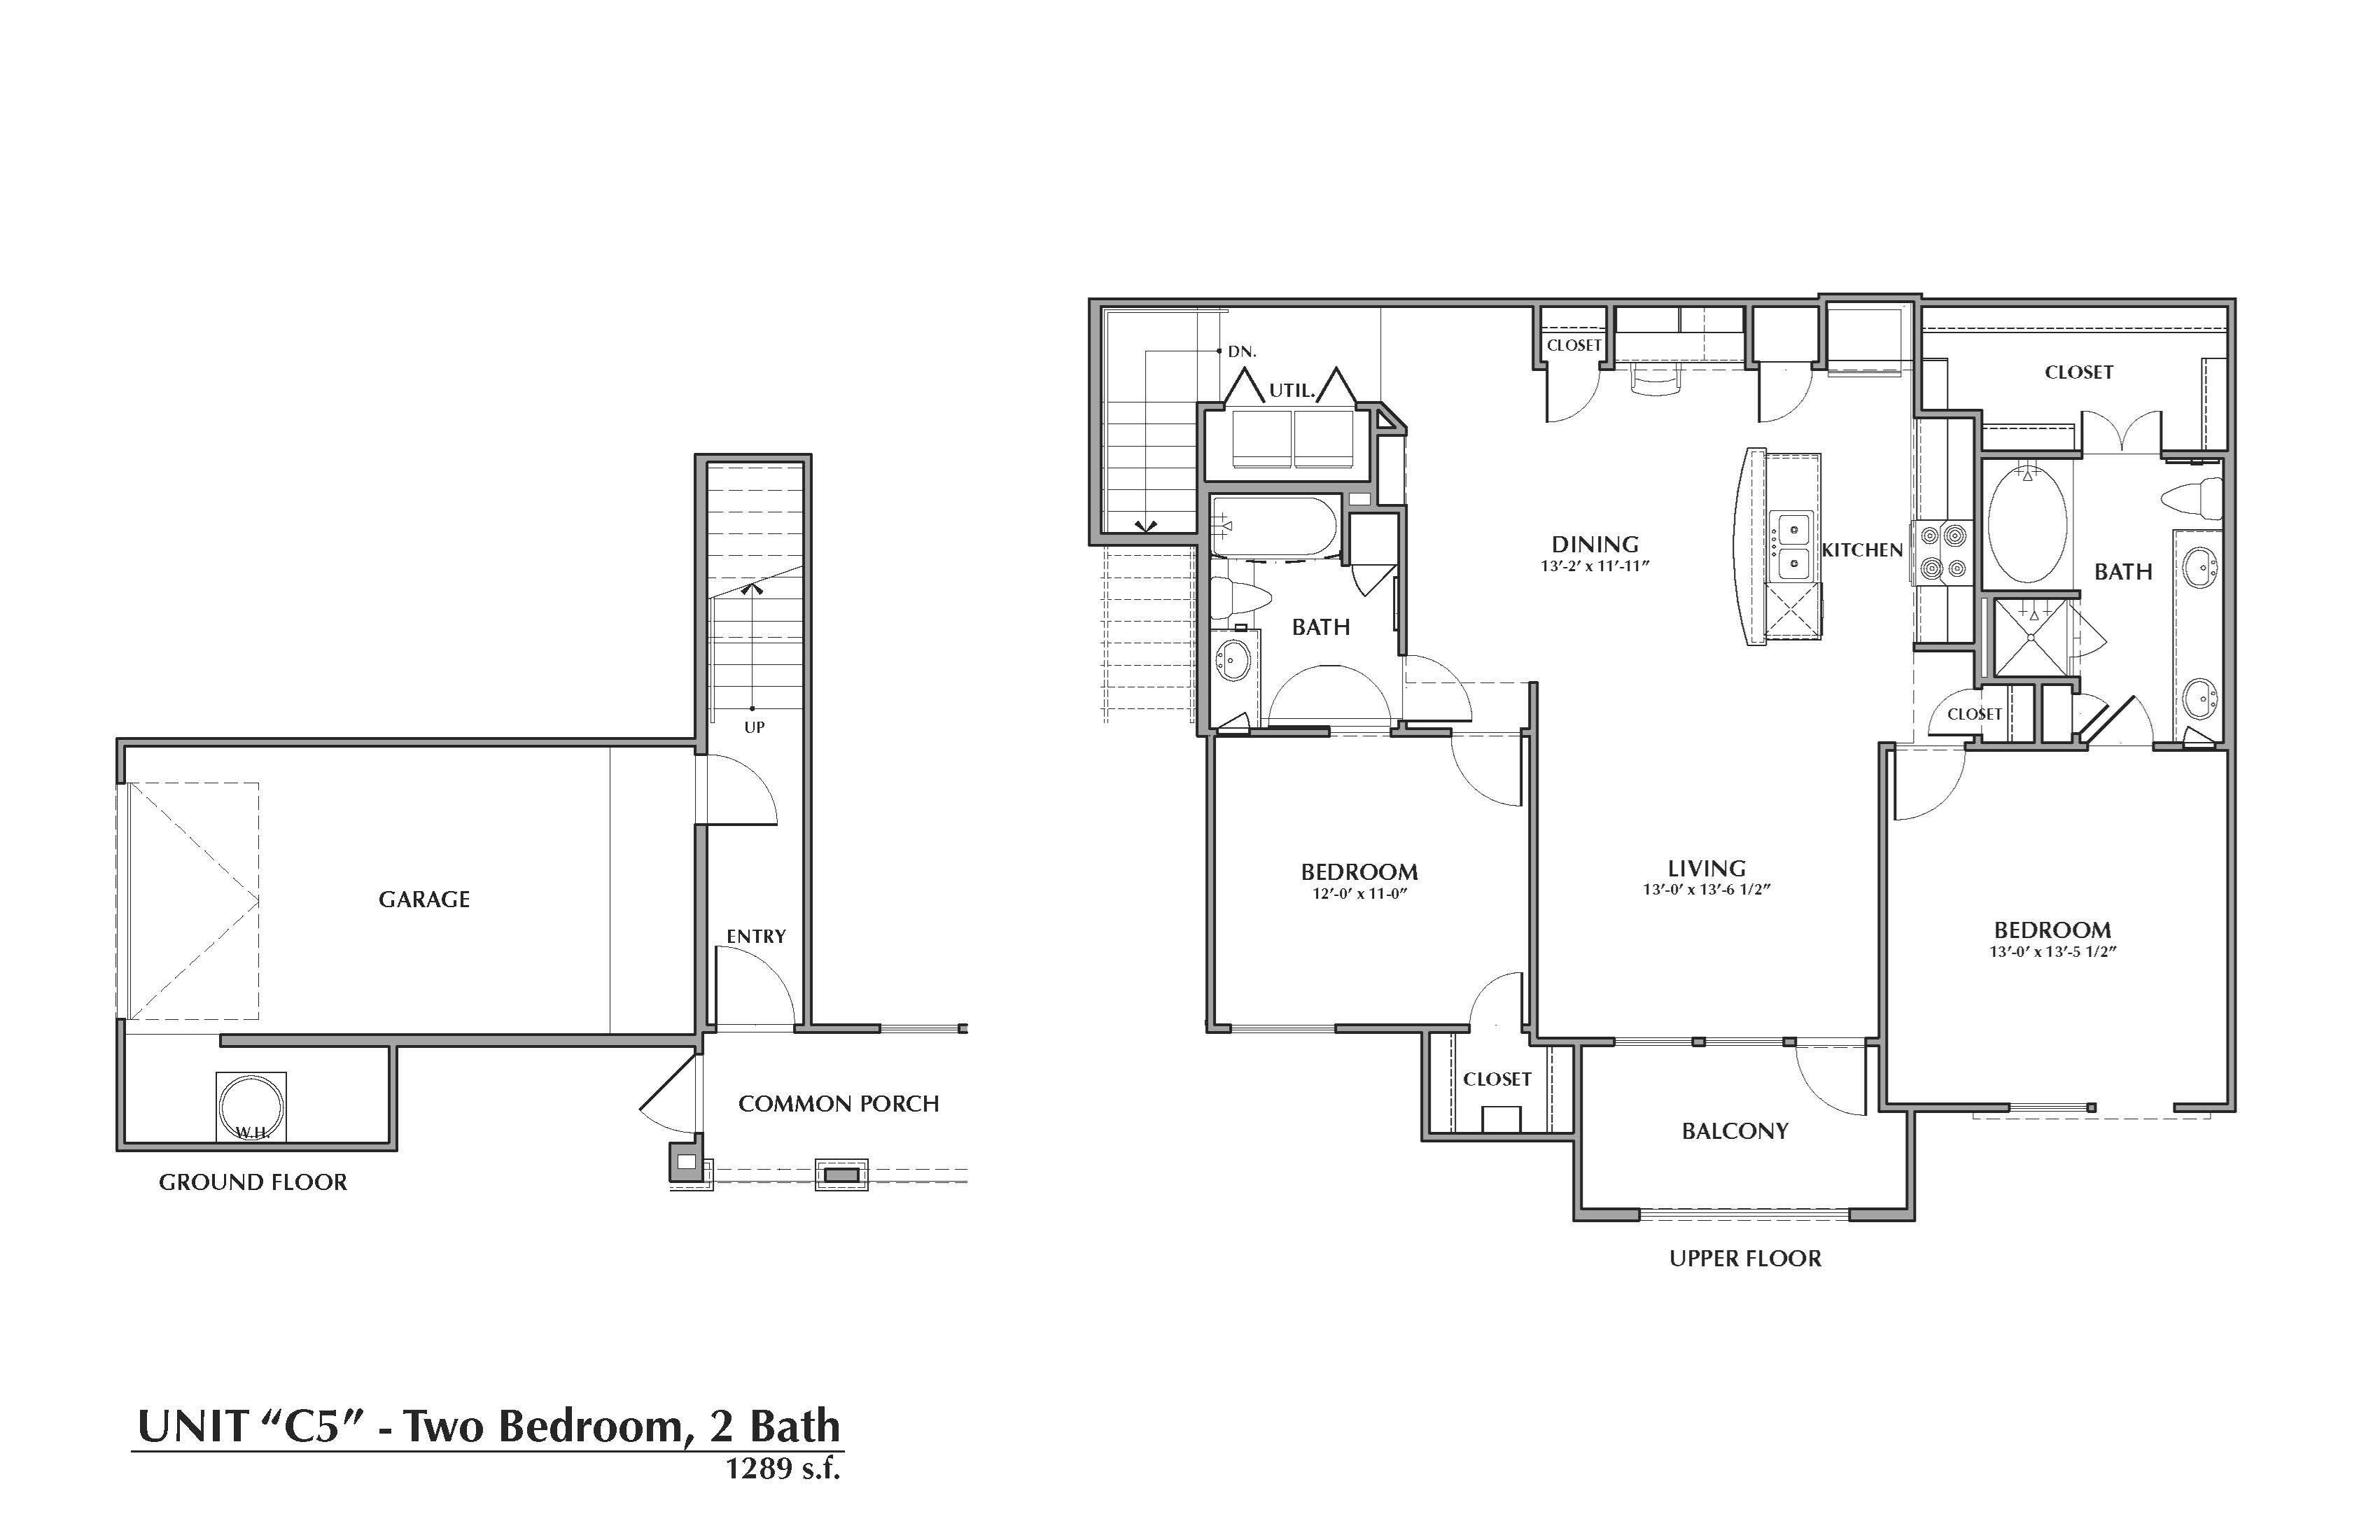 C5-Montgomery, 2x2 1289sf (with attached garage) Floor Plan 17